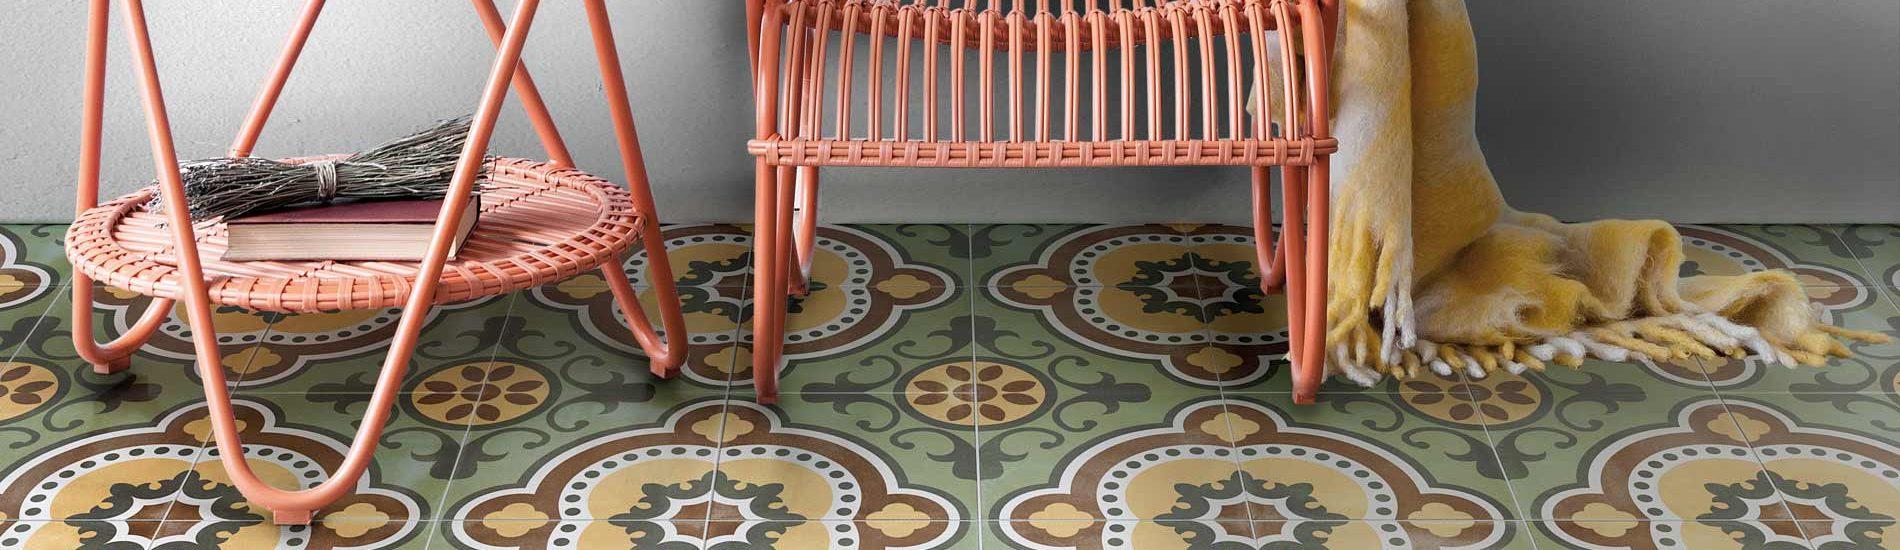 banner-aparici-bondi floor wall tile